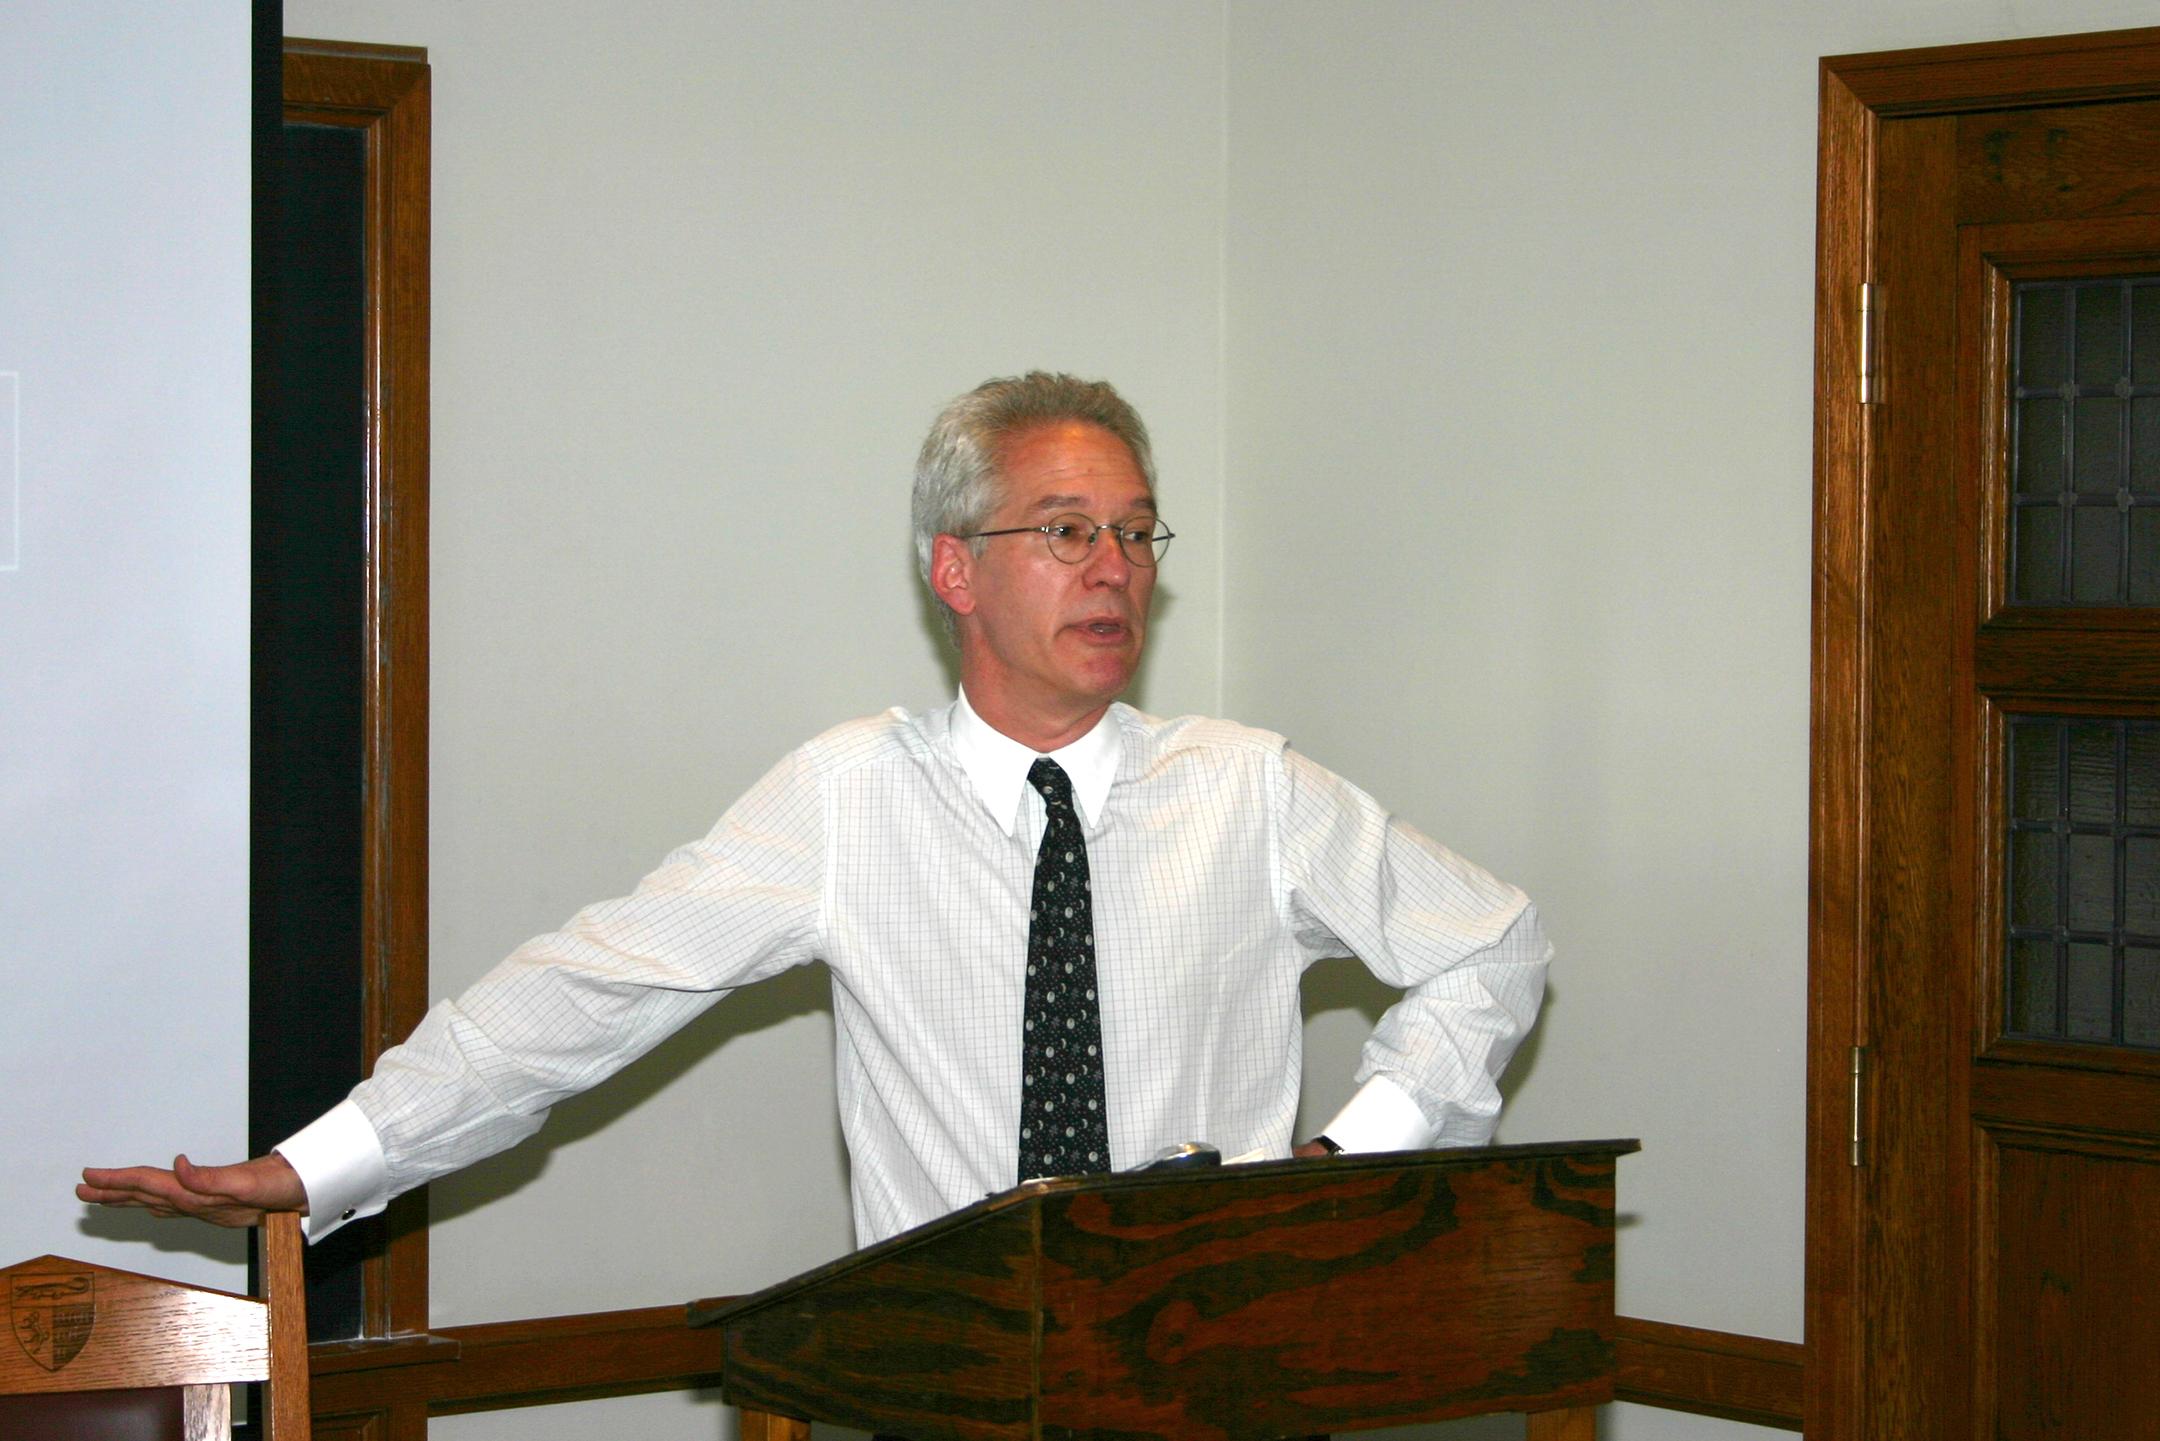 Kris F. Heinzelman '76